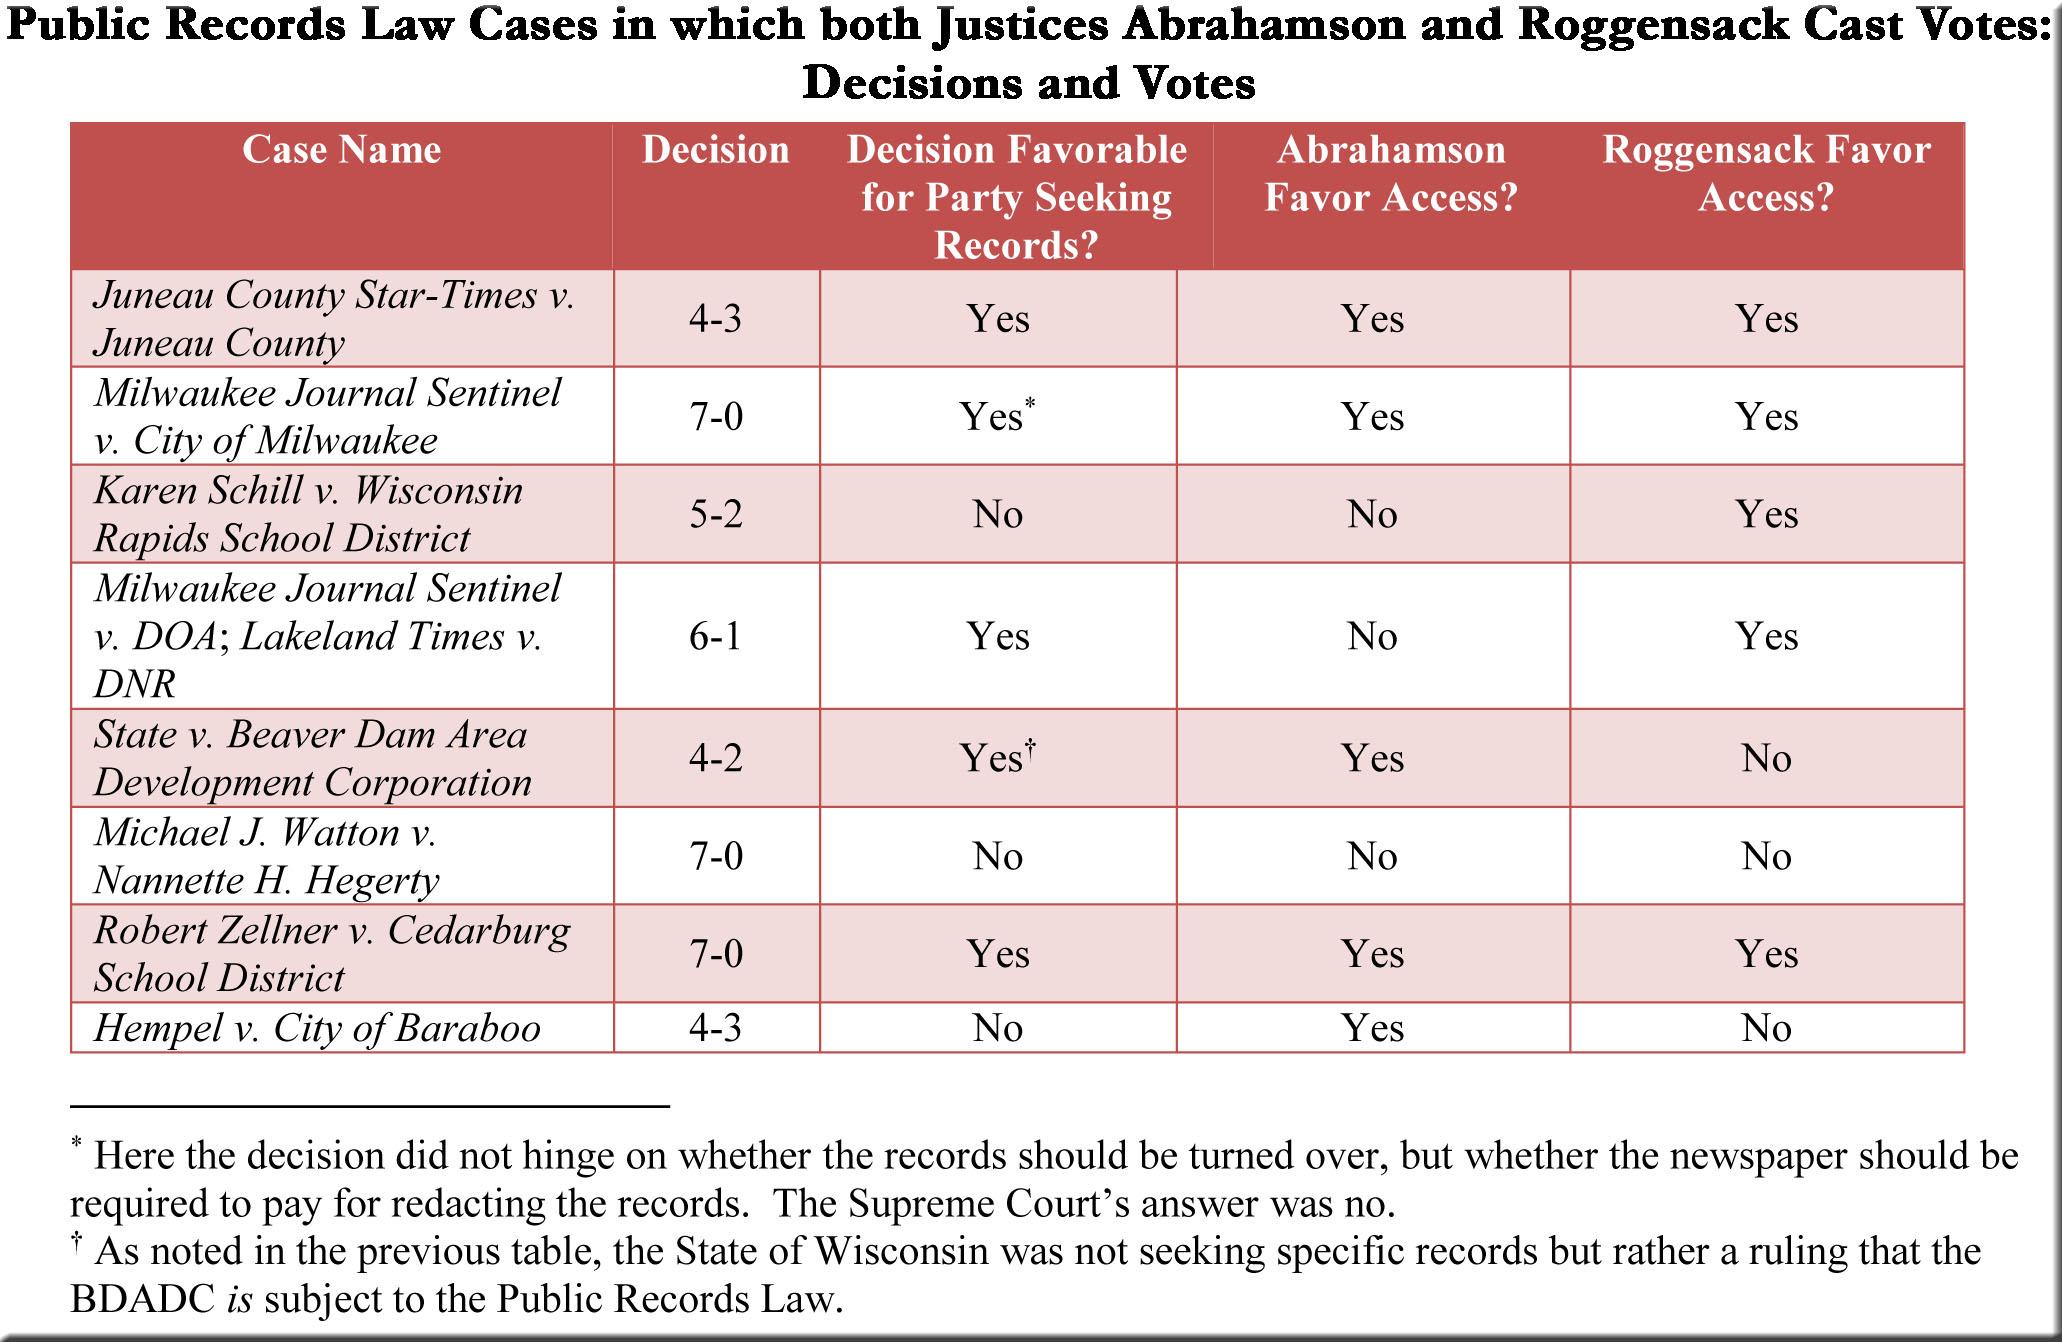 Table B--Public Records Law